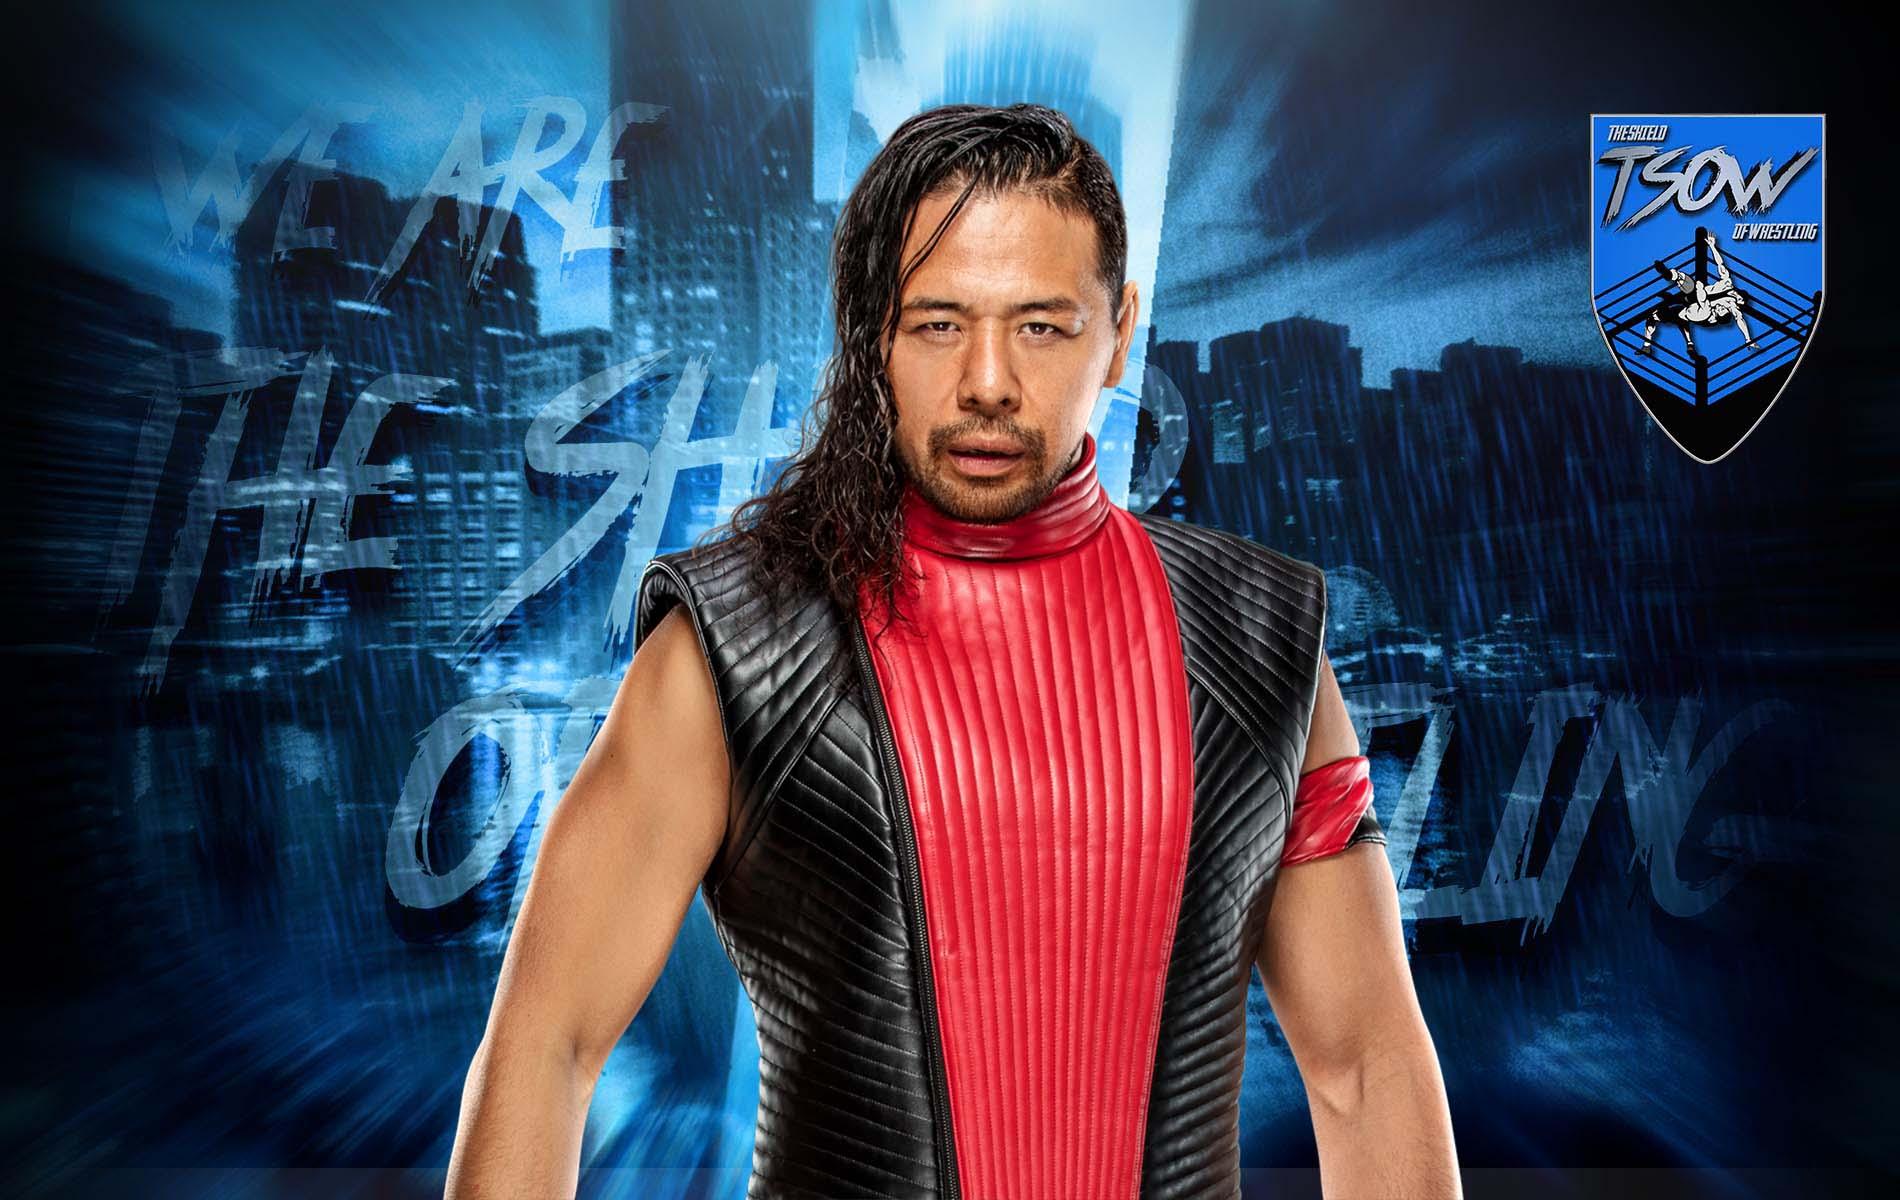 Shinsuke Nakamura ritorna alla gimmick del King of Strong Style